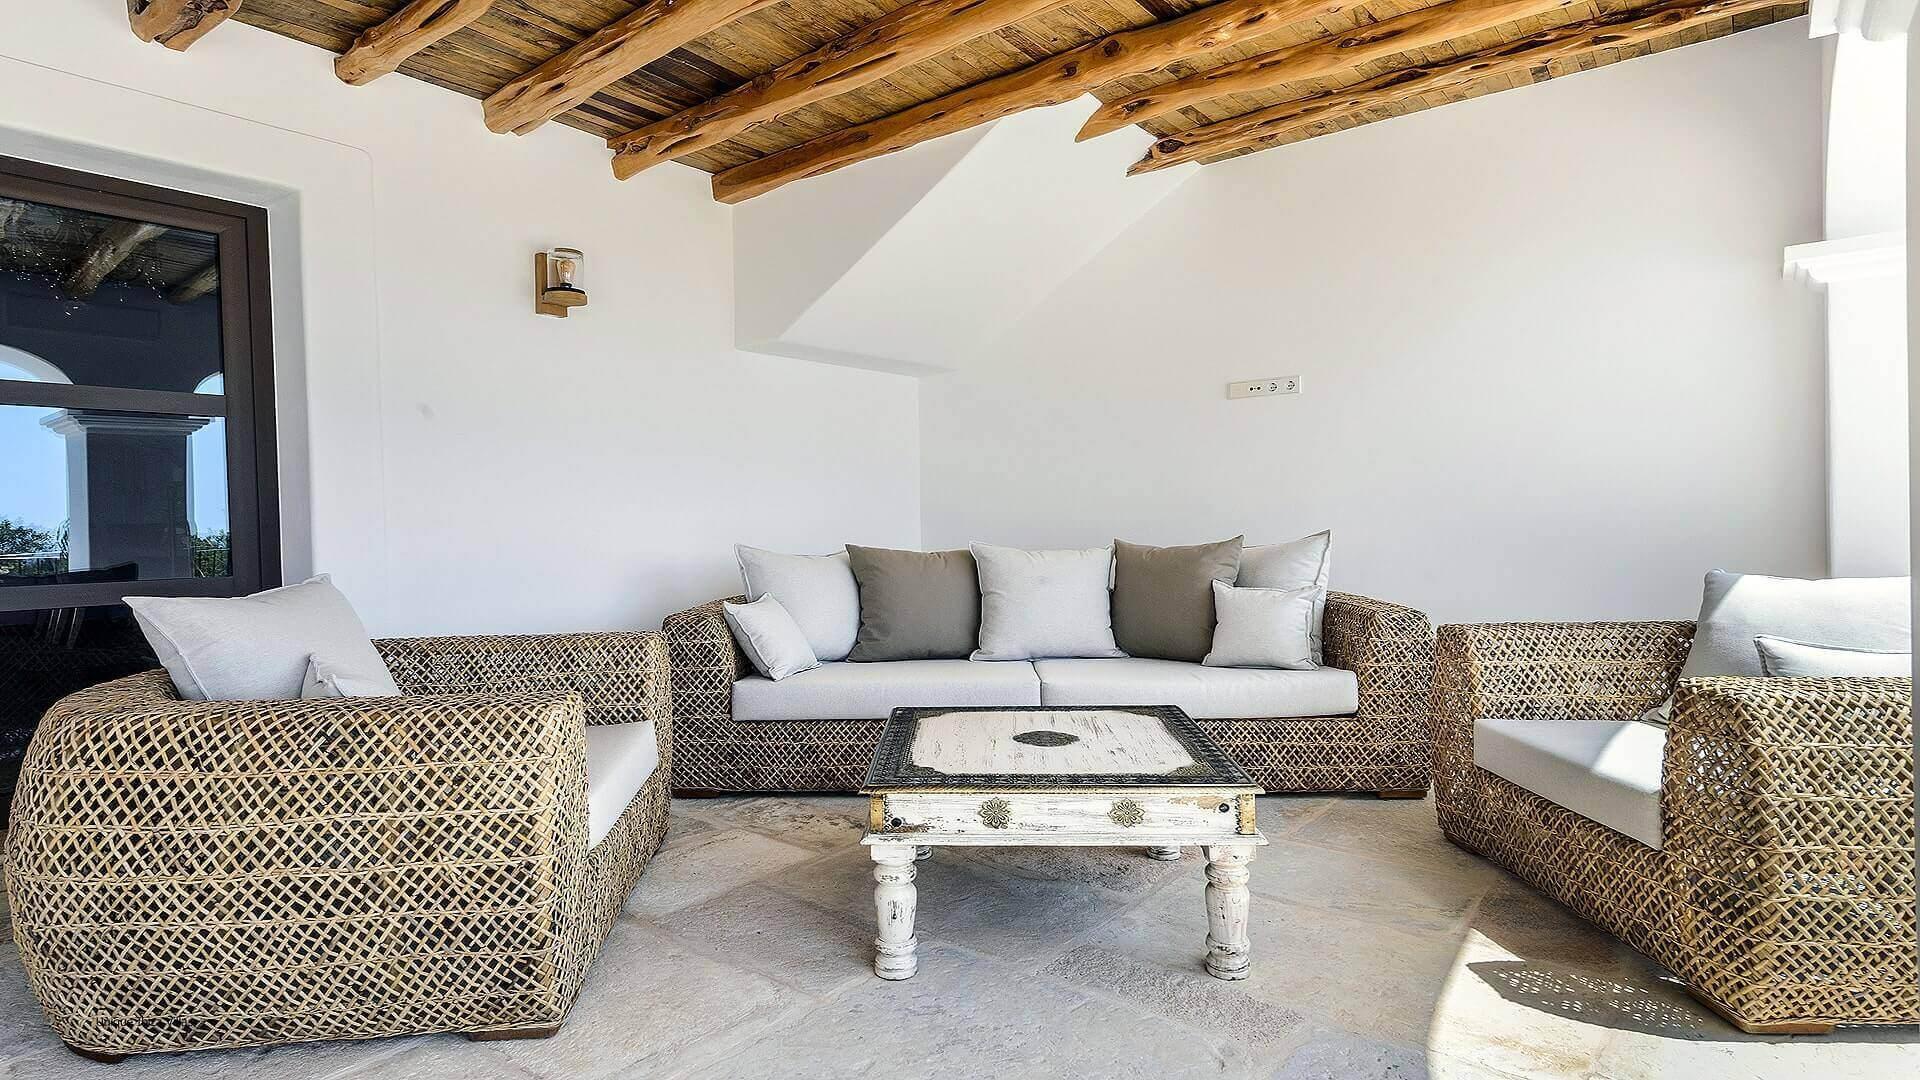 Casa Prats Ibiza 21 Santa Eulalia